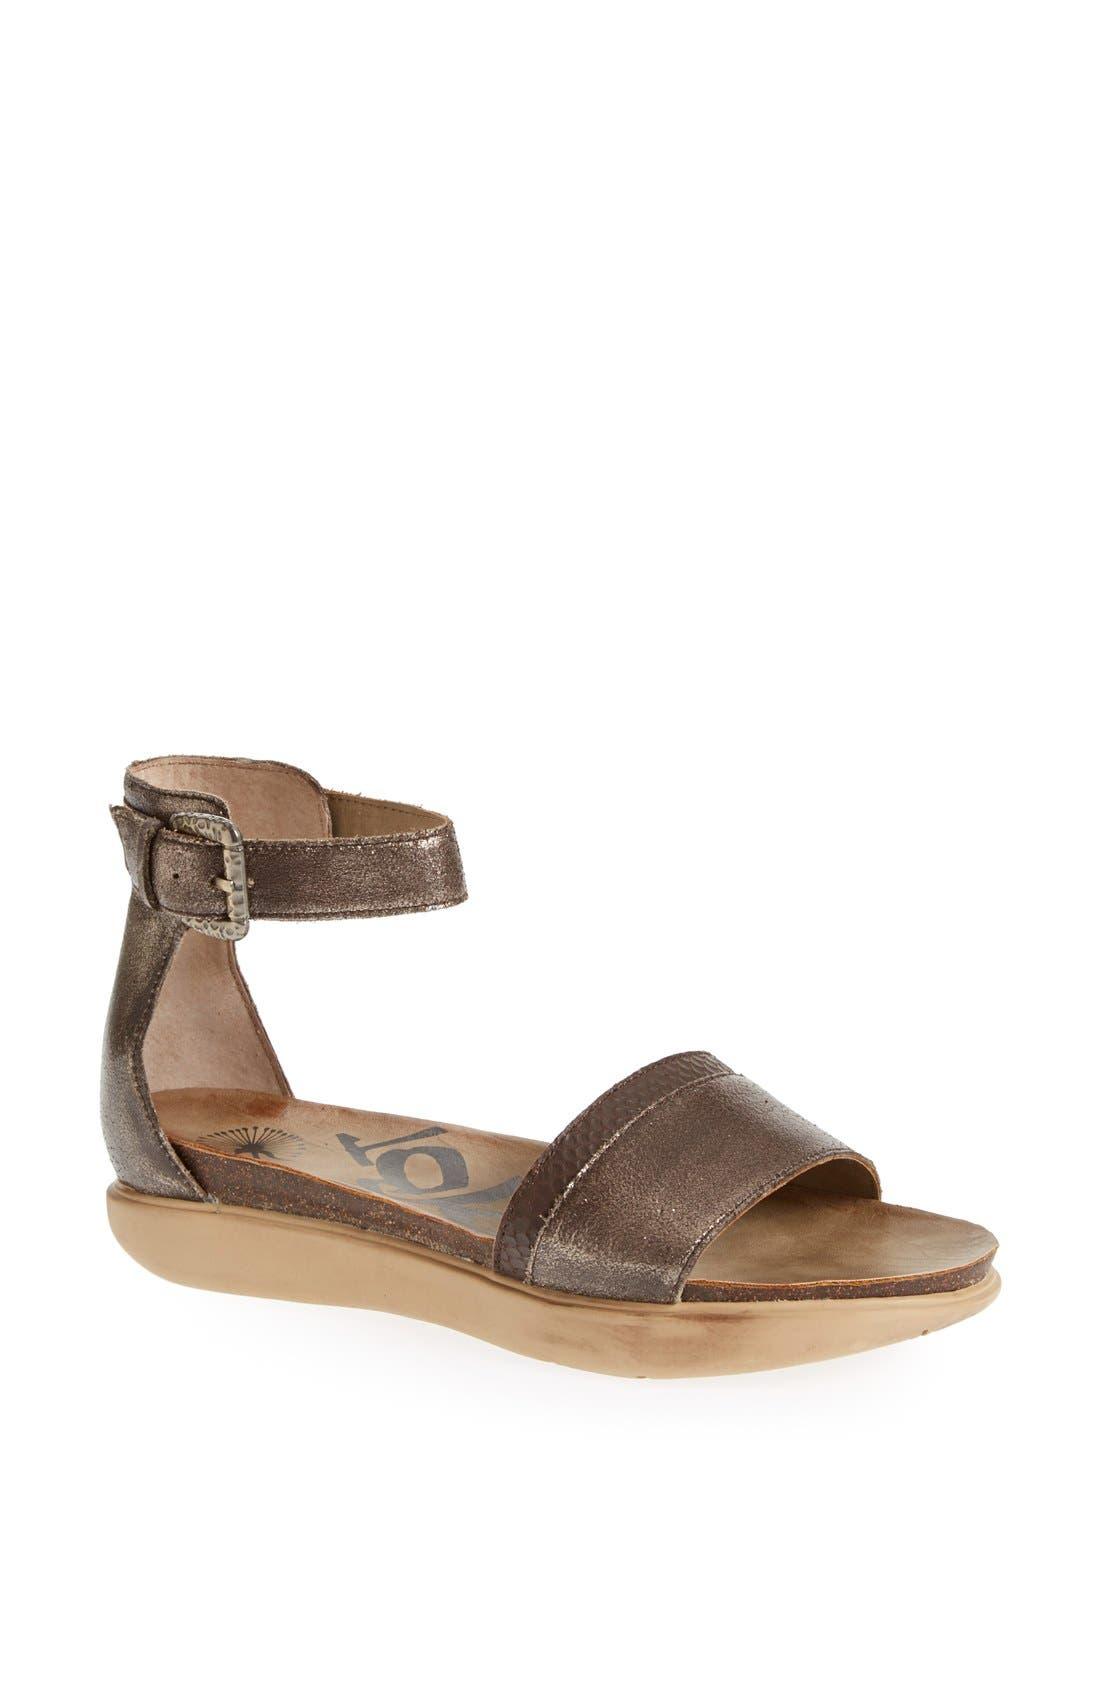 Alternate Image 1 Selected - OTBT 'Martha' Ankle Strap Sandal (Women)